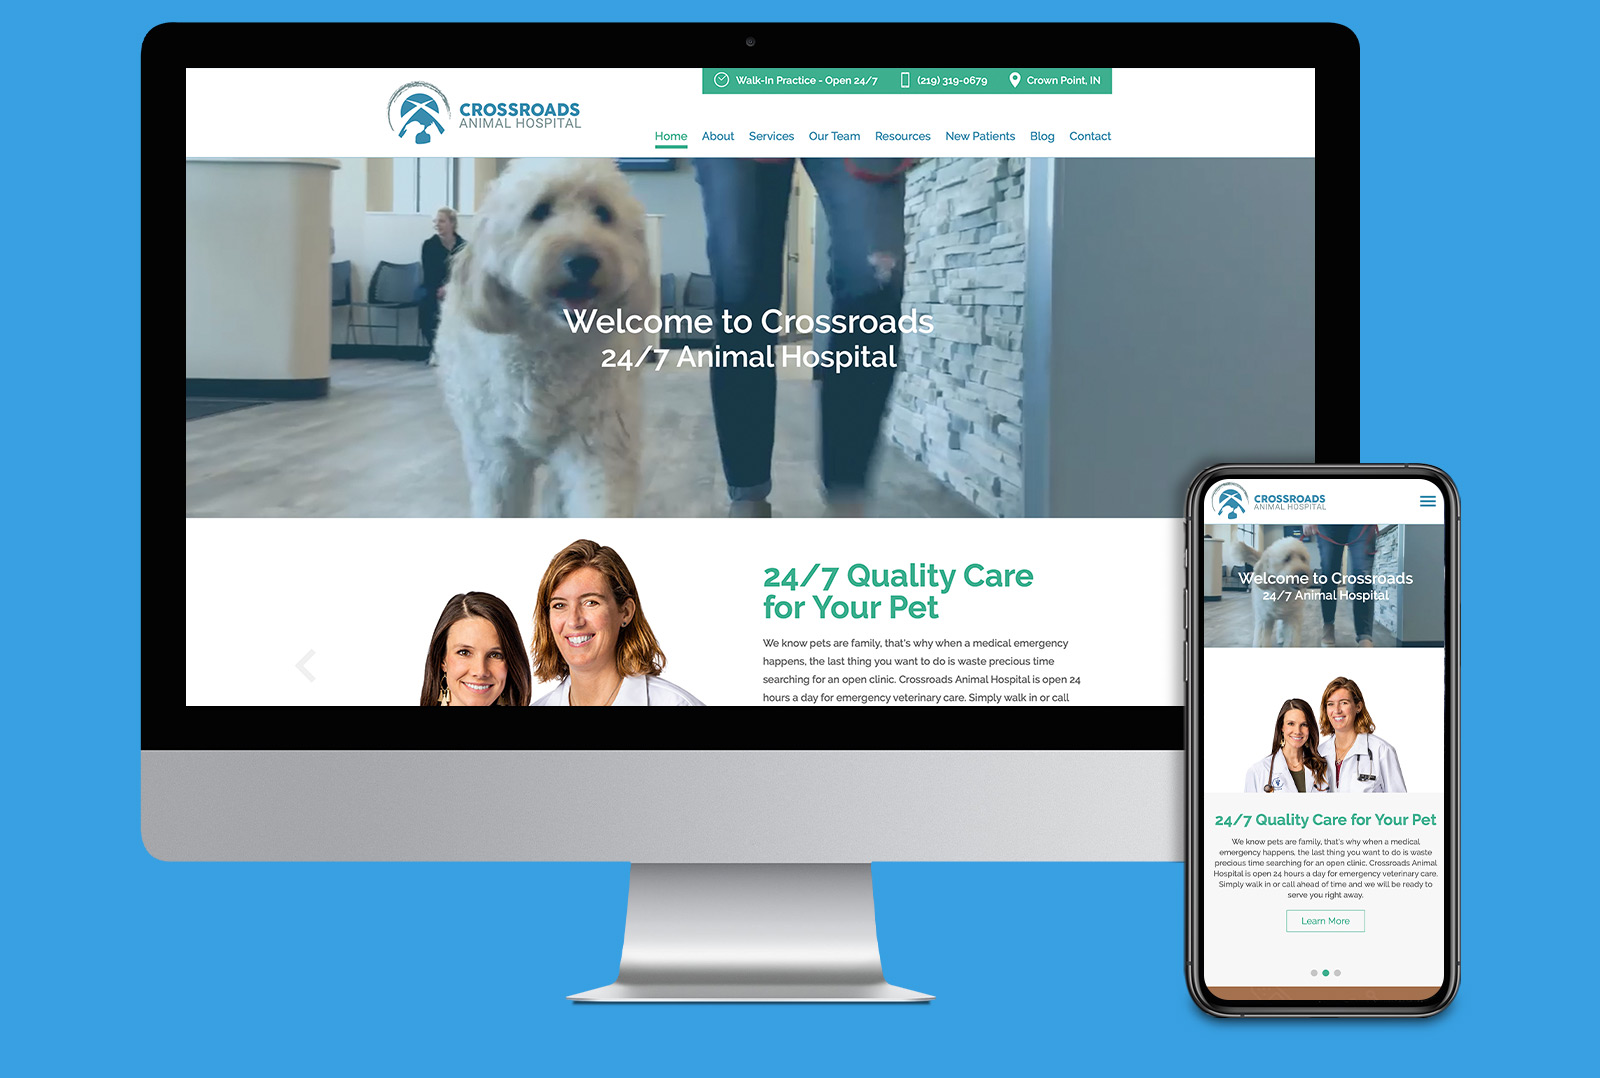 Crossroads Animal Hospital website landing page on computer screen